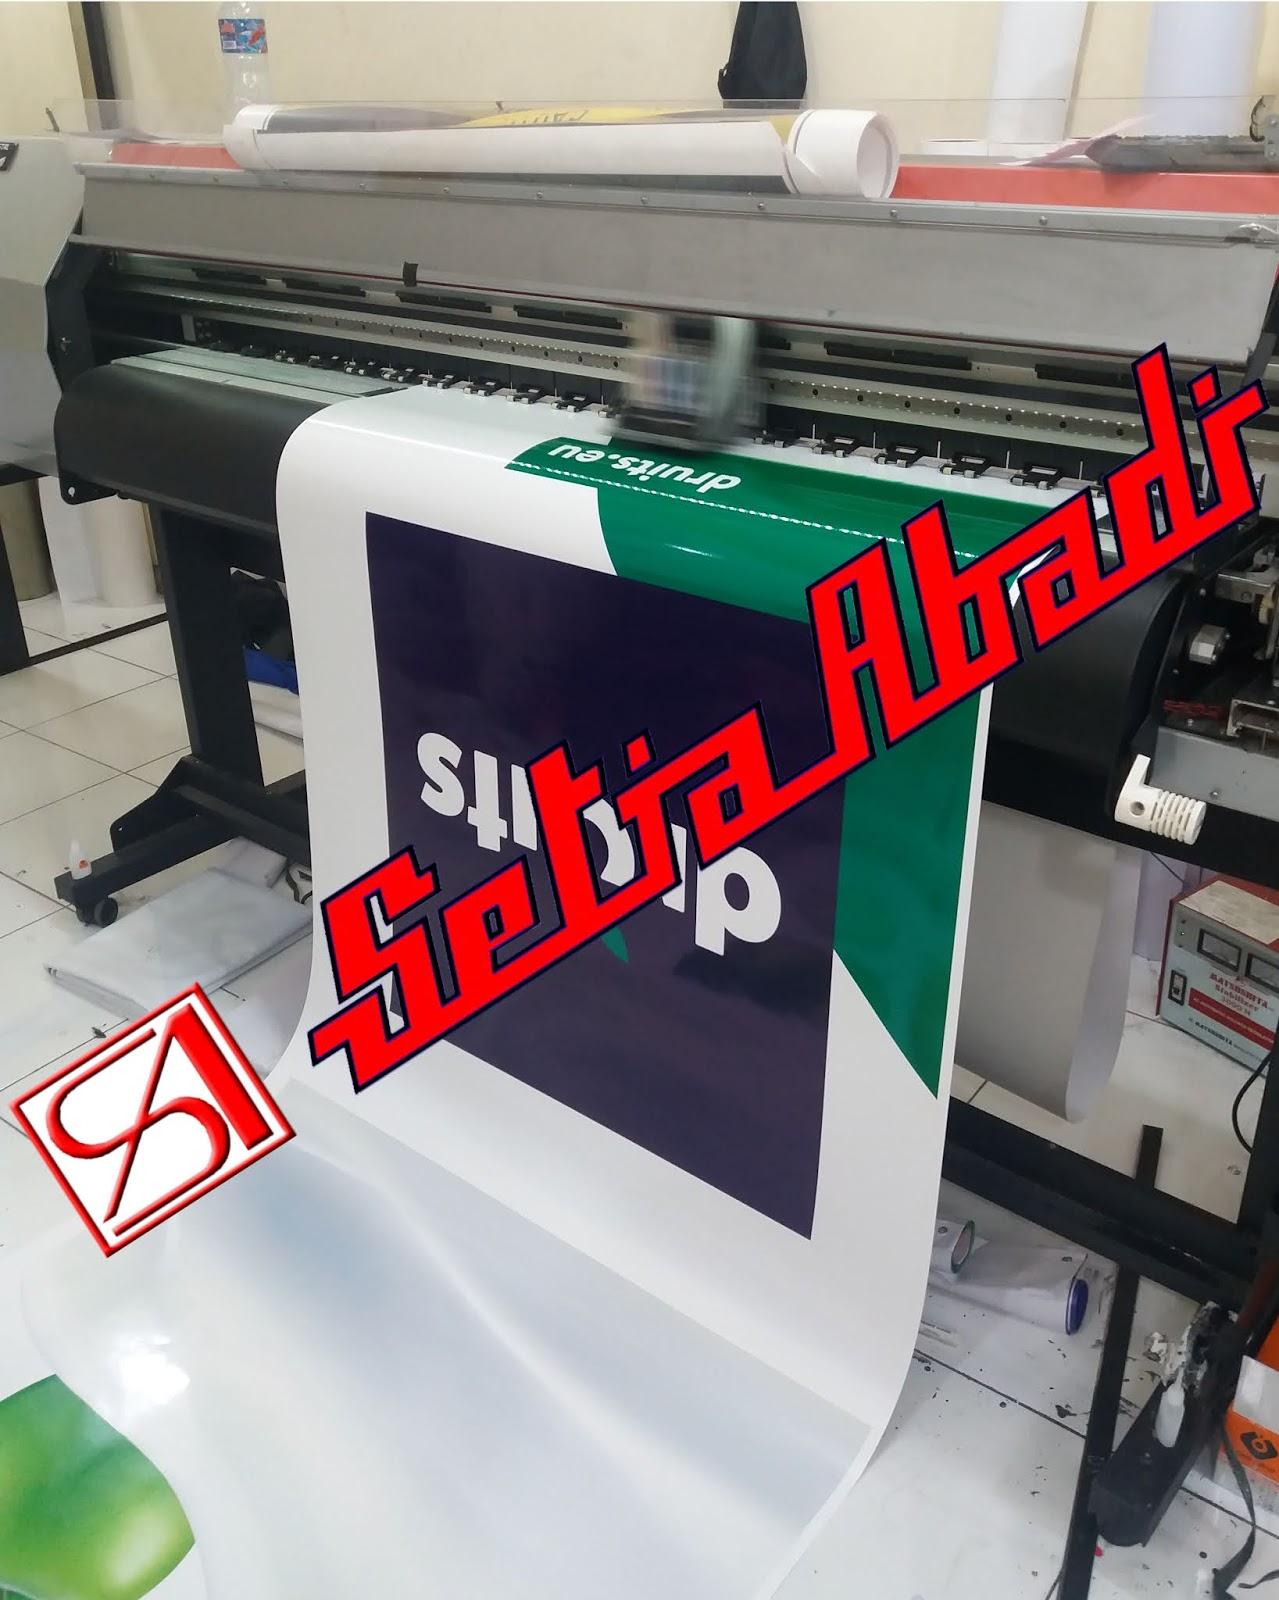 https://www.offsetprinting21.com/2019/01/jasa-cetak-stiker-ritrama-di-Jakarta.html